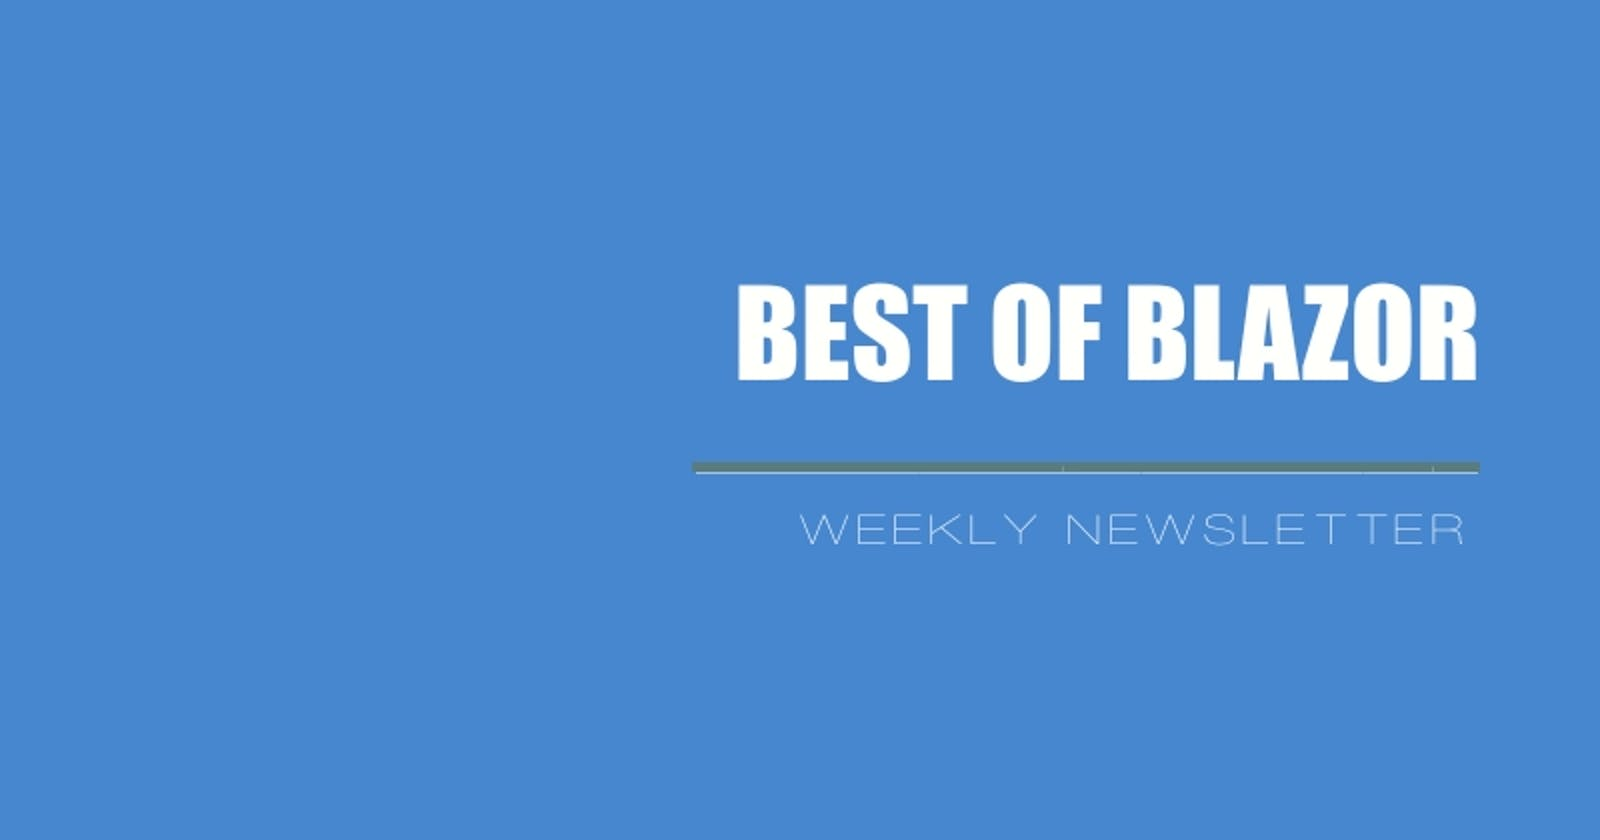 Blazor Weekly Newsletter #24